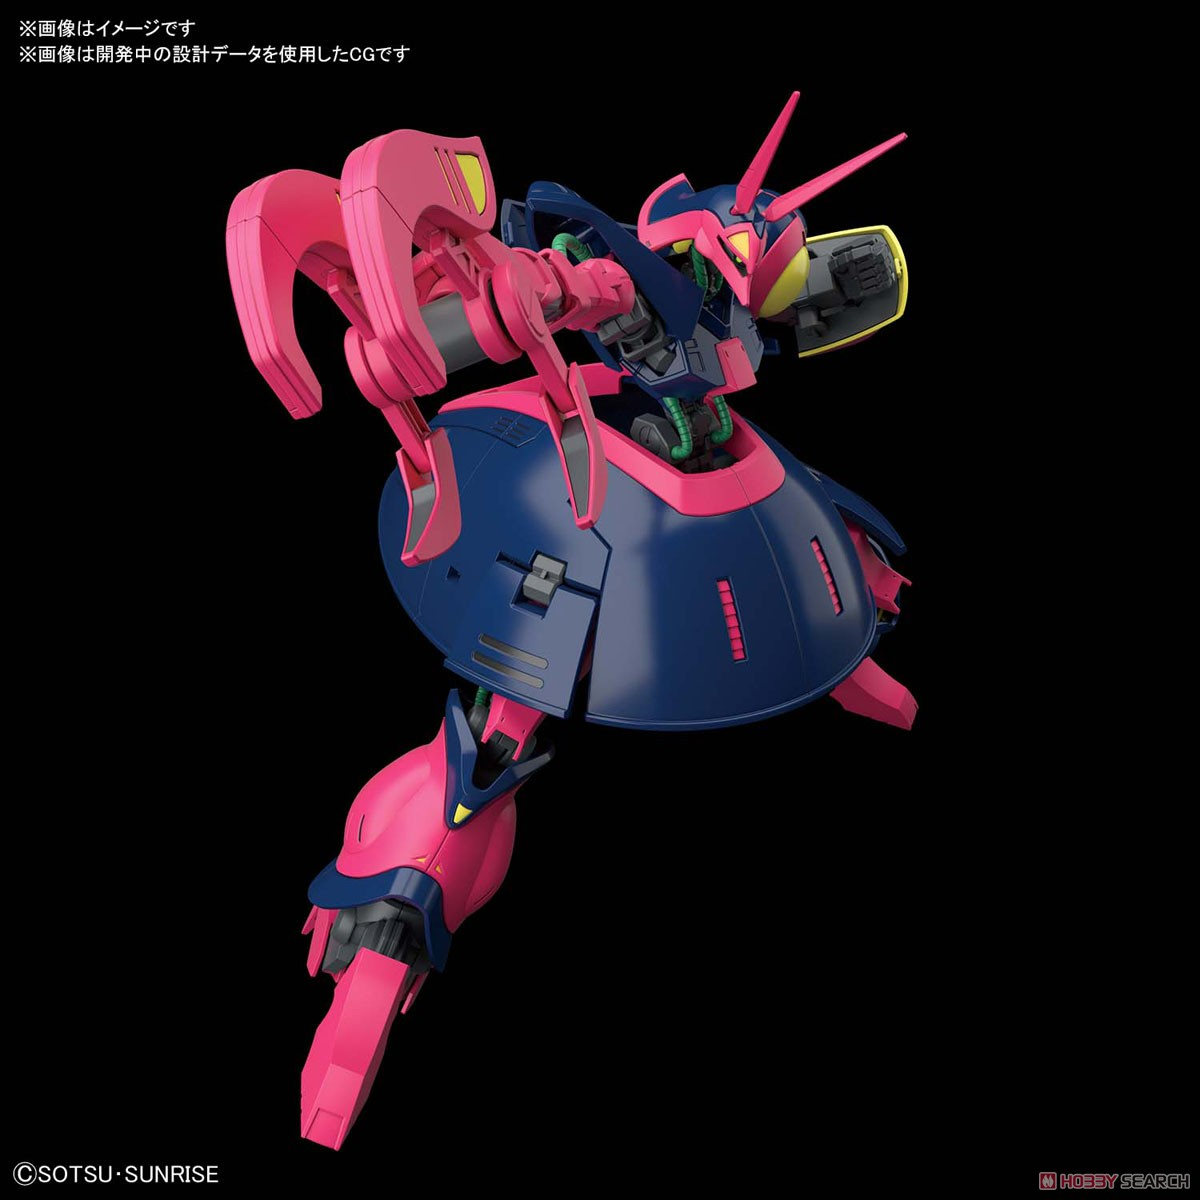 HGUC 1/144『バウンド・ドック』機動戦士Zガンダム プラモデル-014